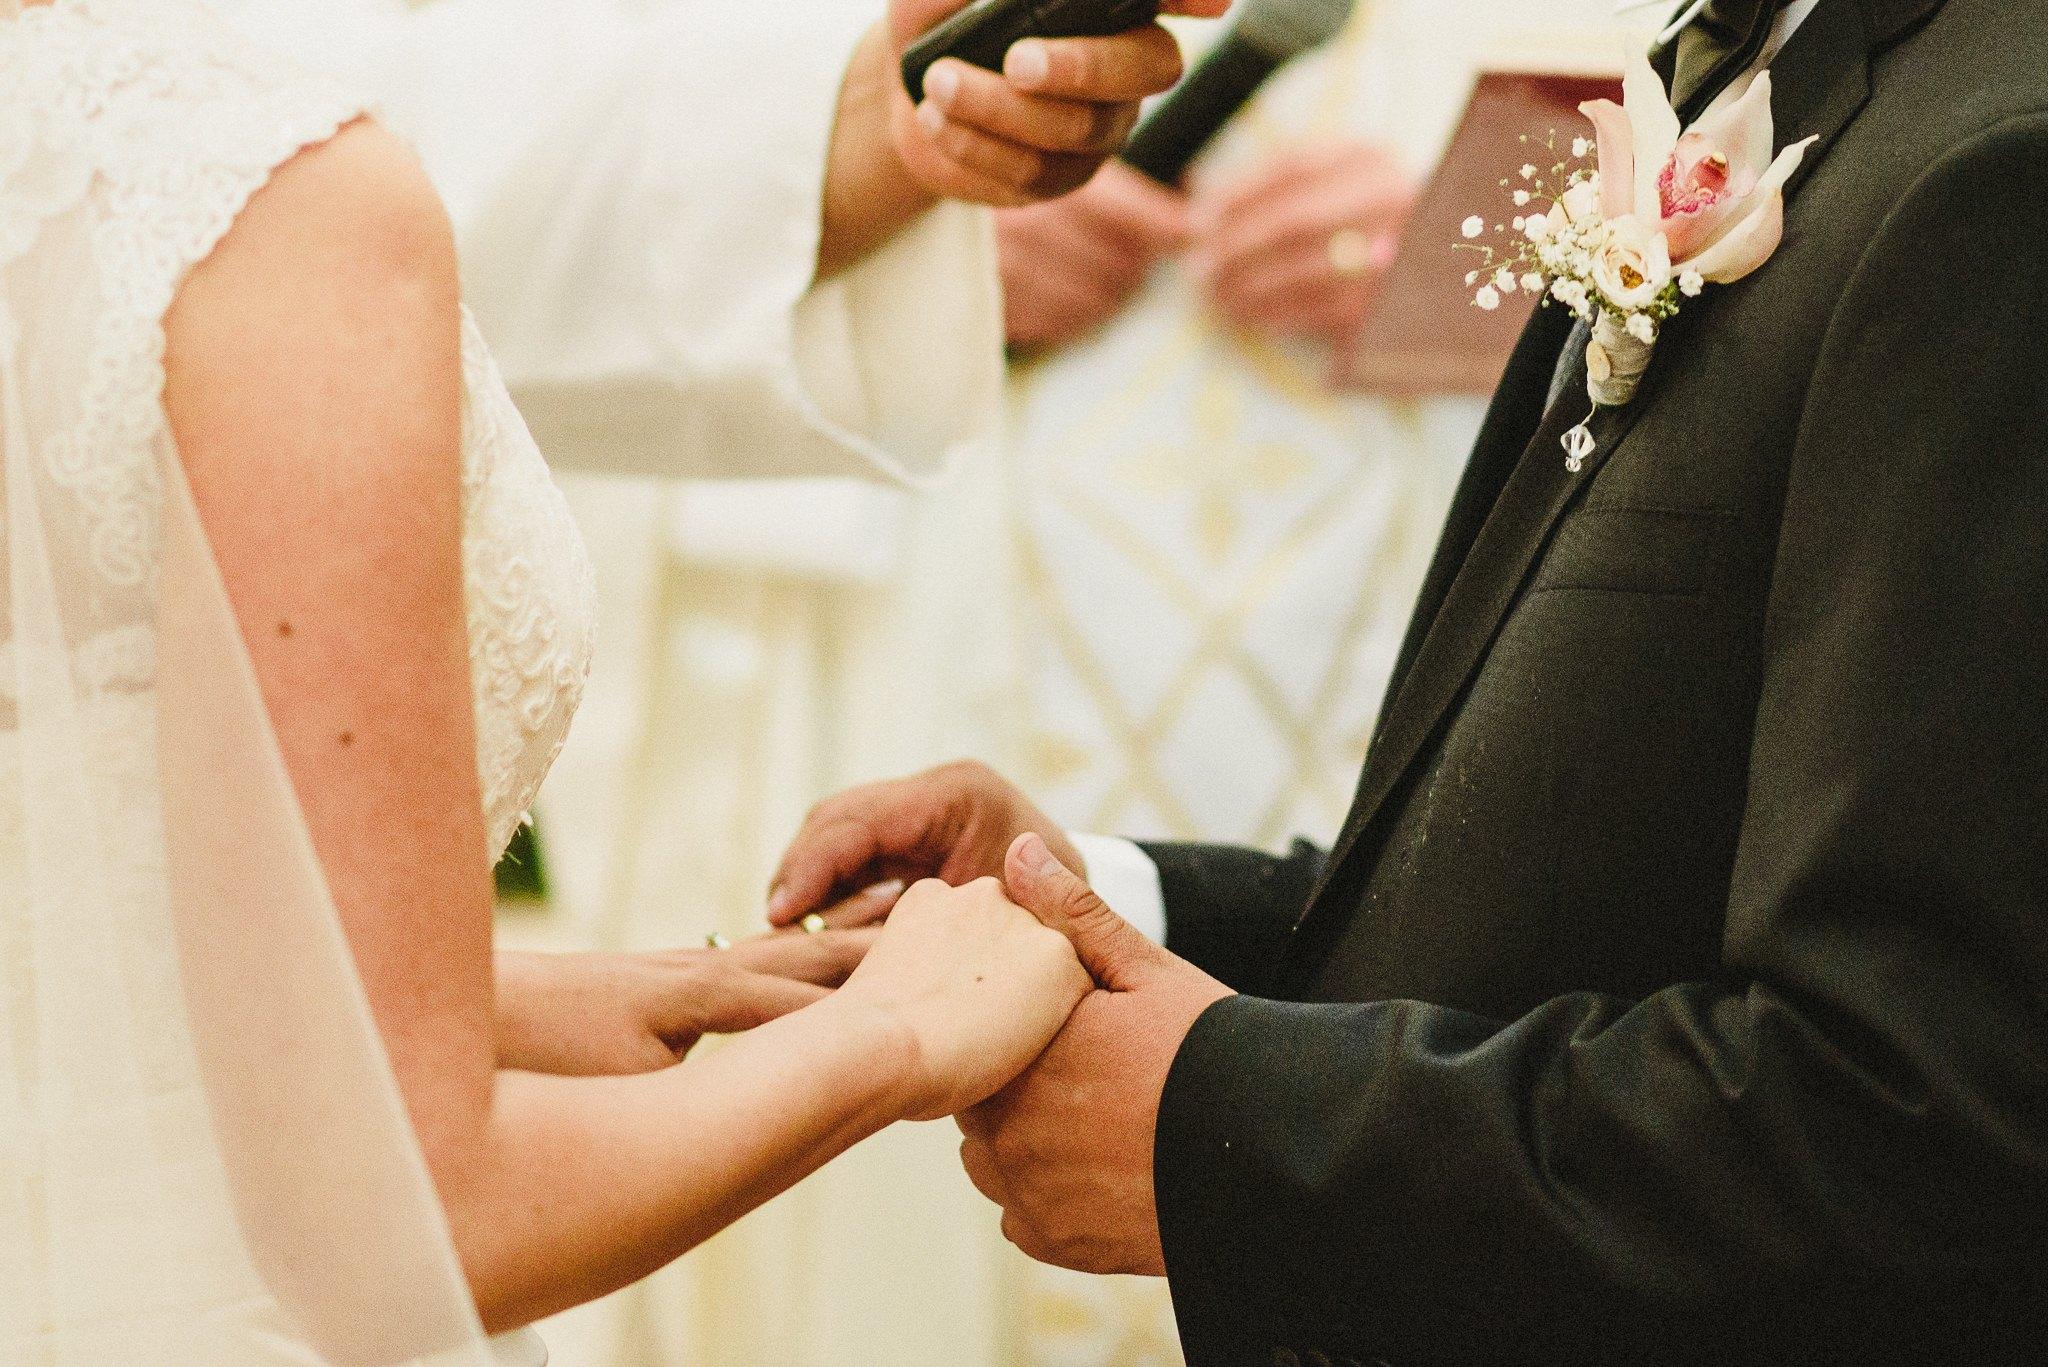 Wedding-Boda-Tulancingo-Hidalgo-Salon-Essenzia-Luis-Houdin-26-film